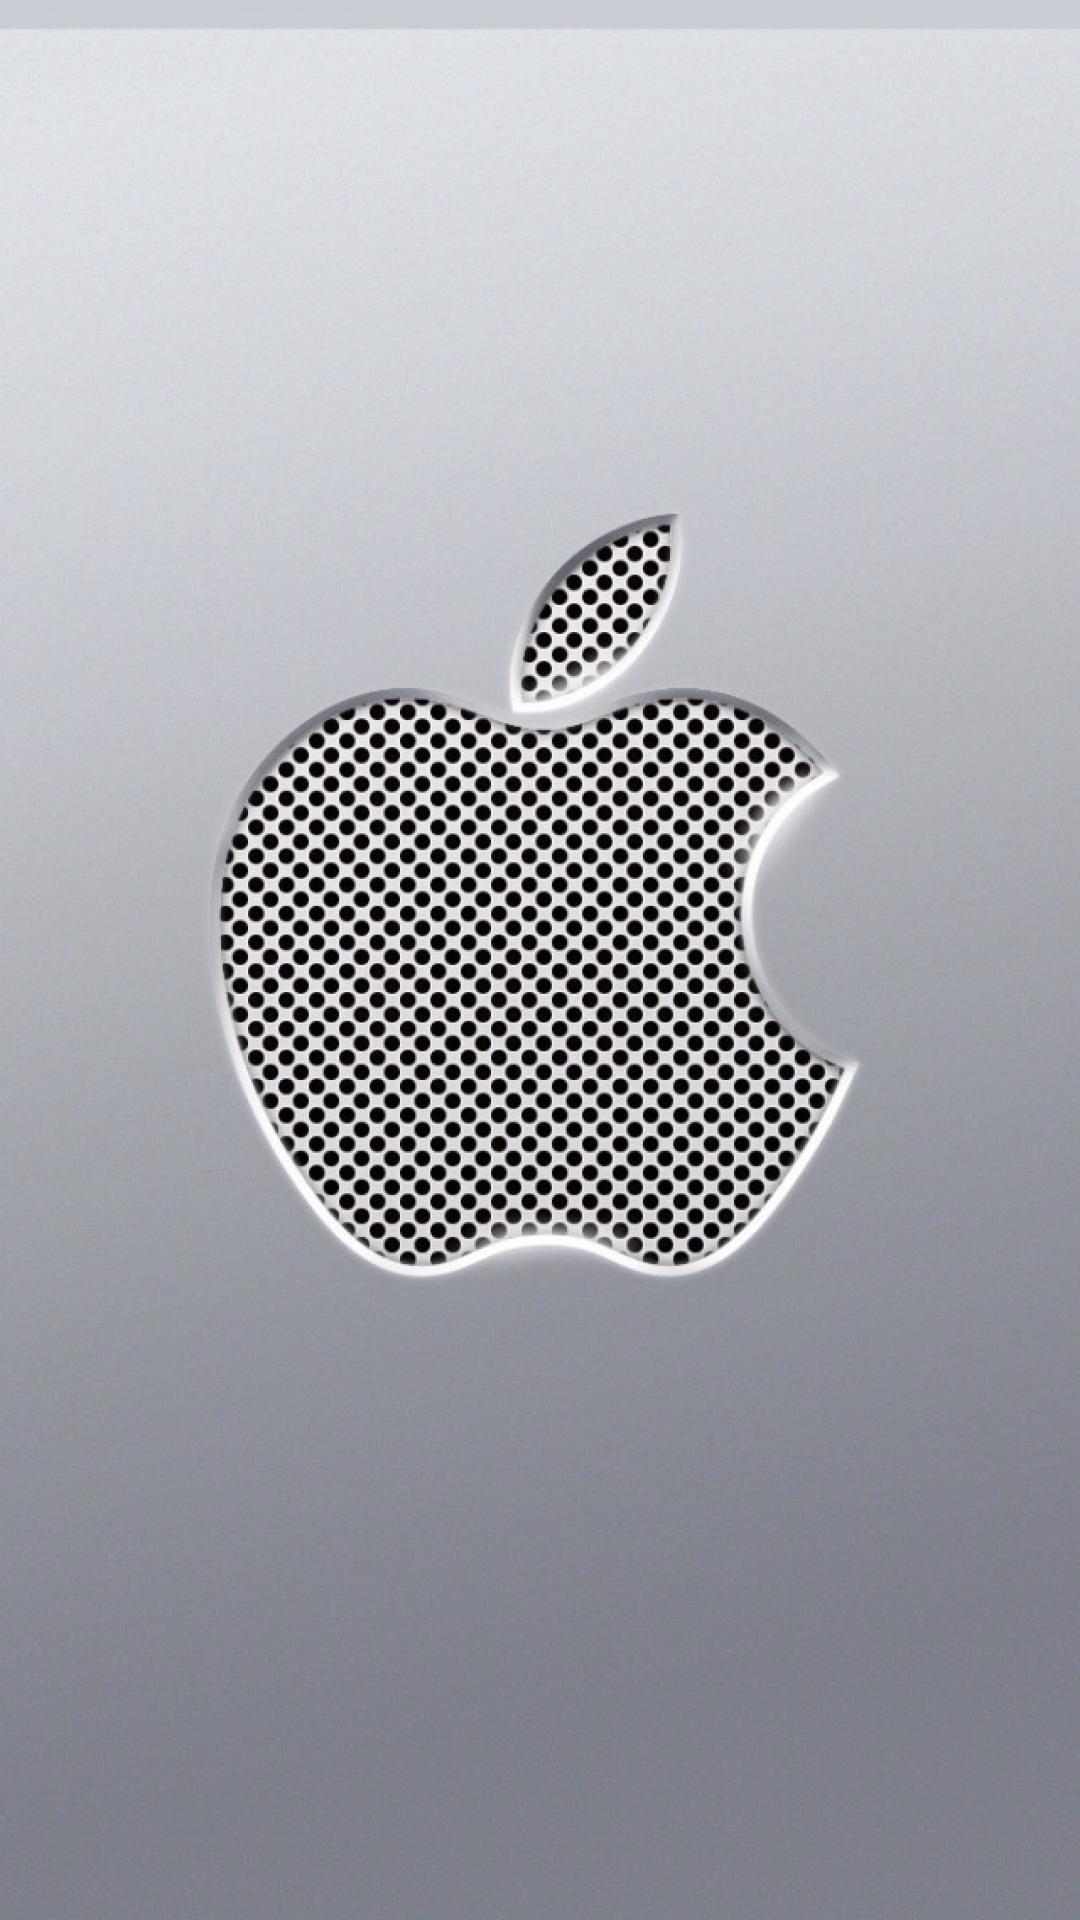 Logo iPhone wallpaper